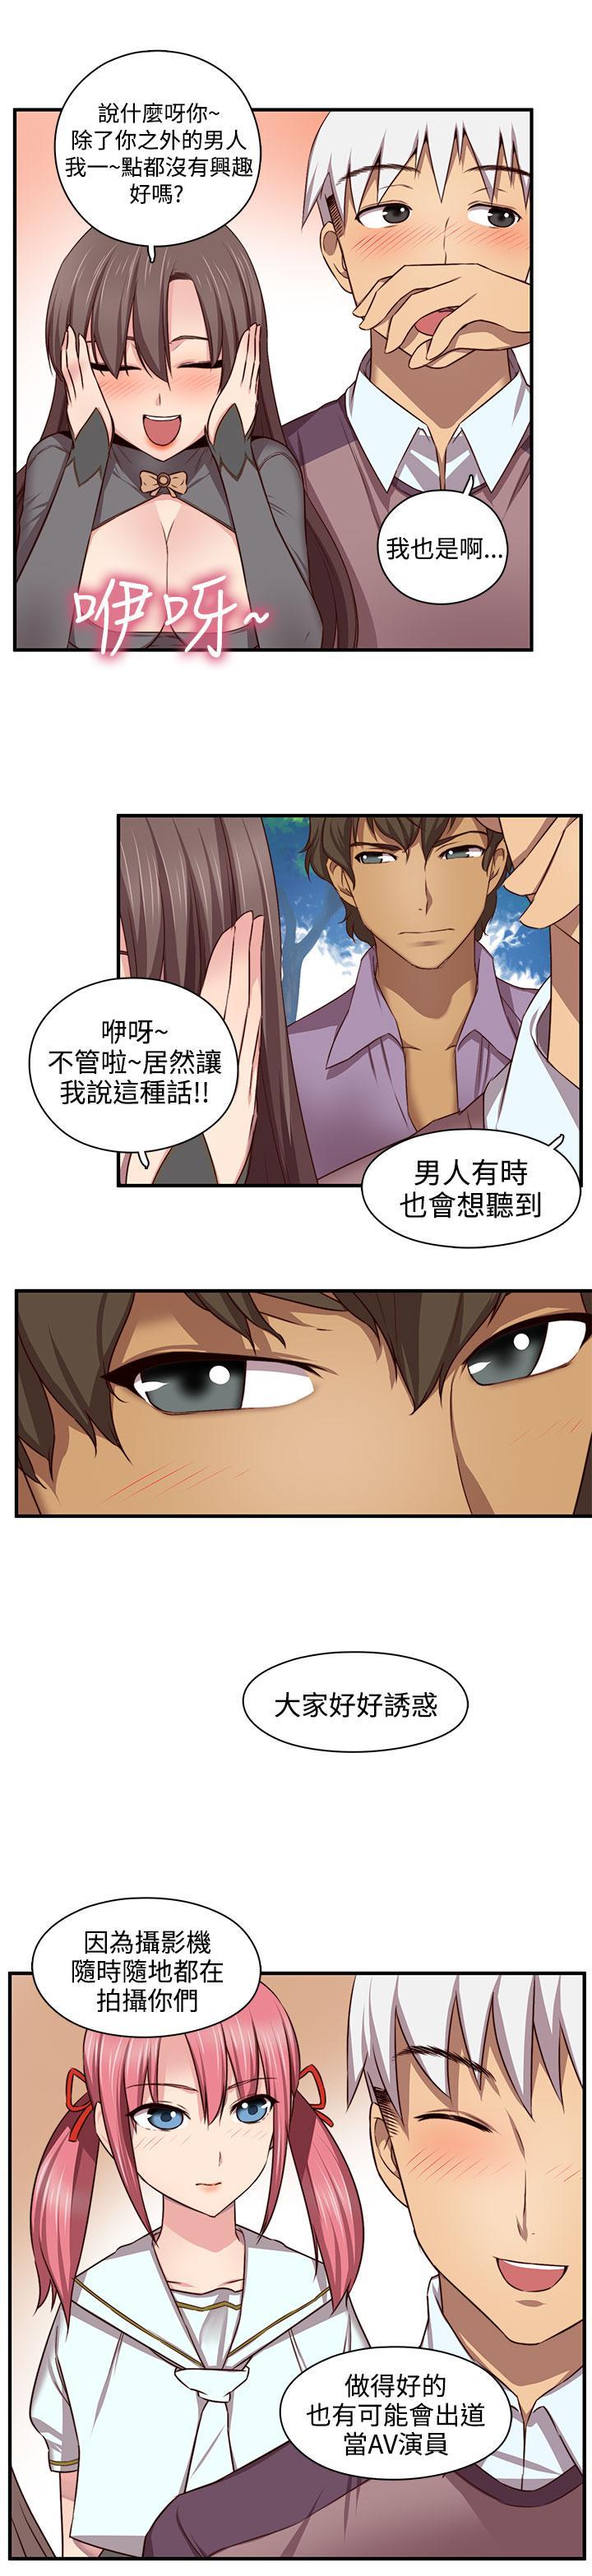 [Dasum & Puutaro] H-Campus H校园<第2季> ch.41-46 (chinese) 123